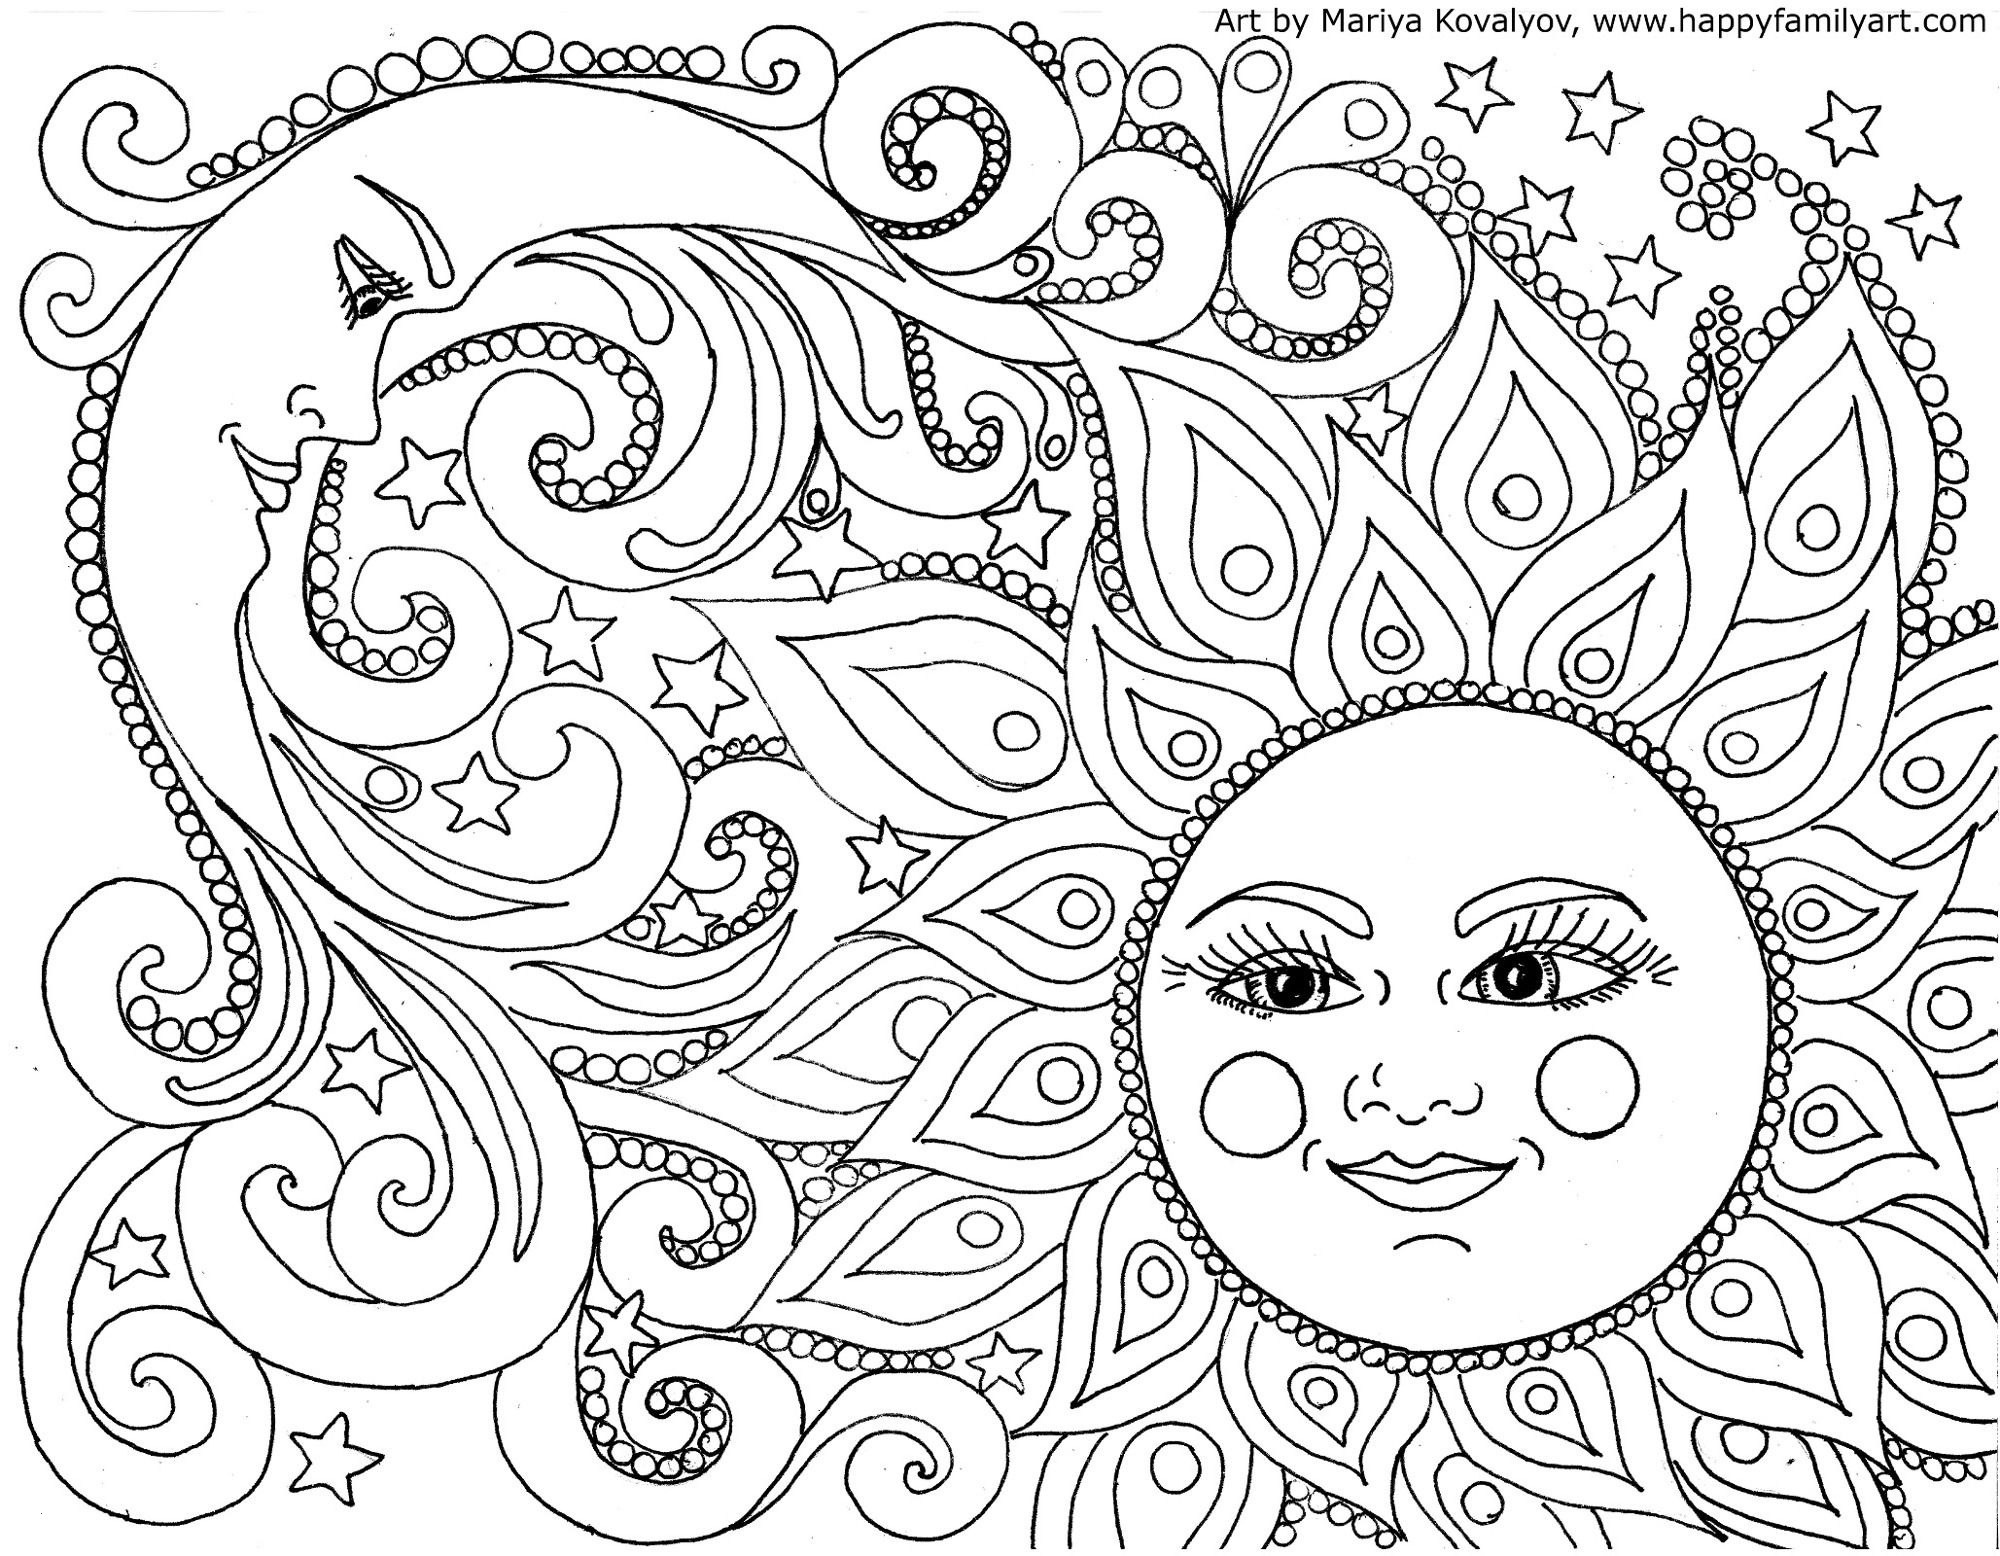 Mandalas For Kids - Fresh Free Printable Mandala Coloring Pages - Free Printable Mandala Coloring Pages